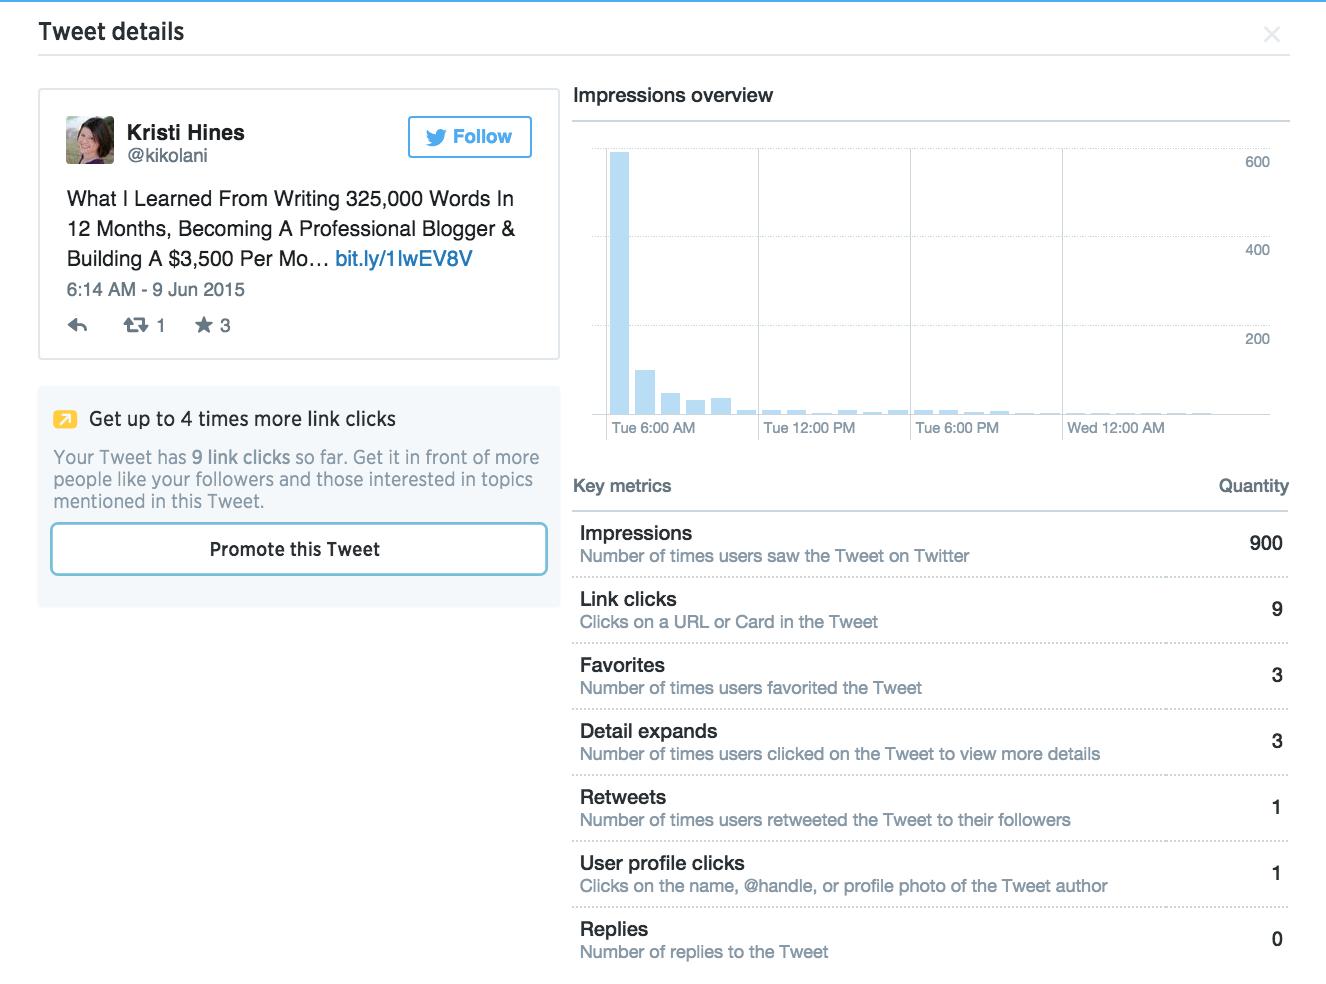 twitter metrics tweet details screenshot